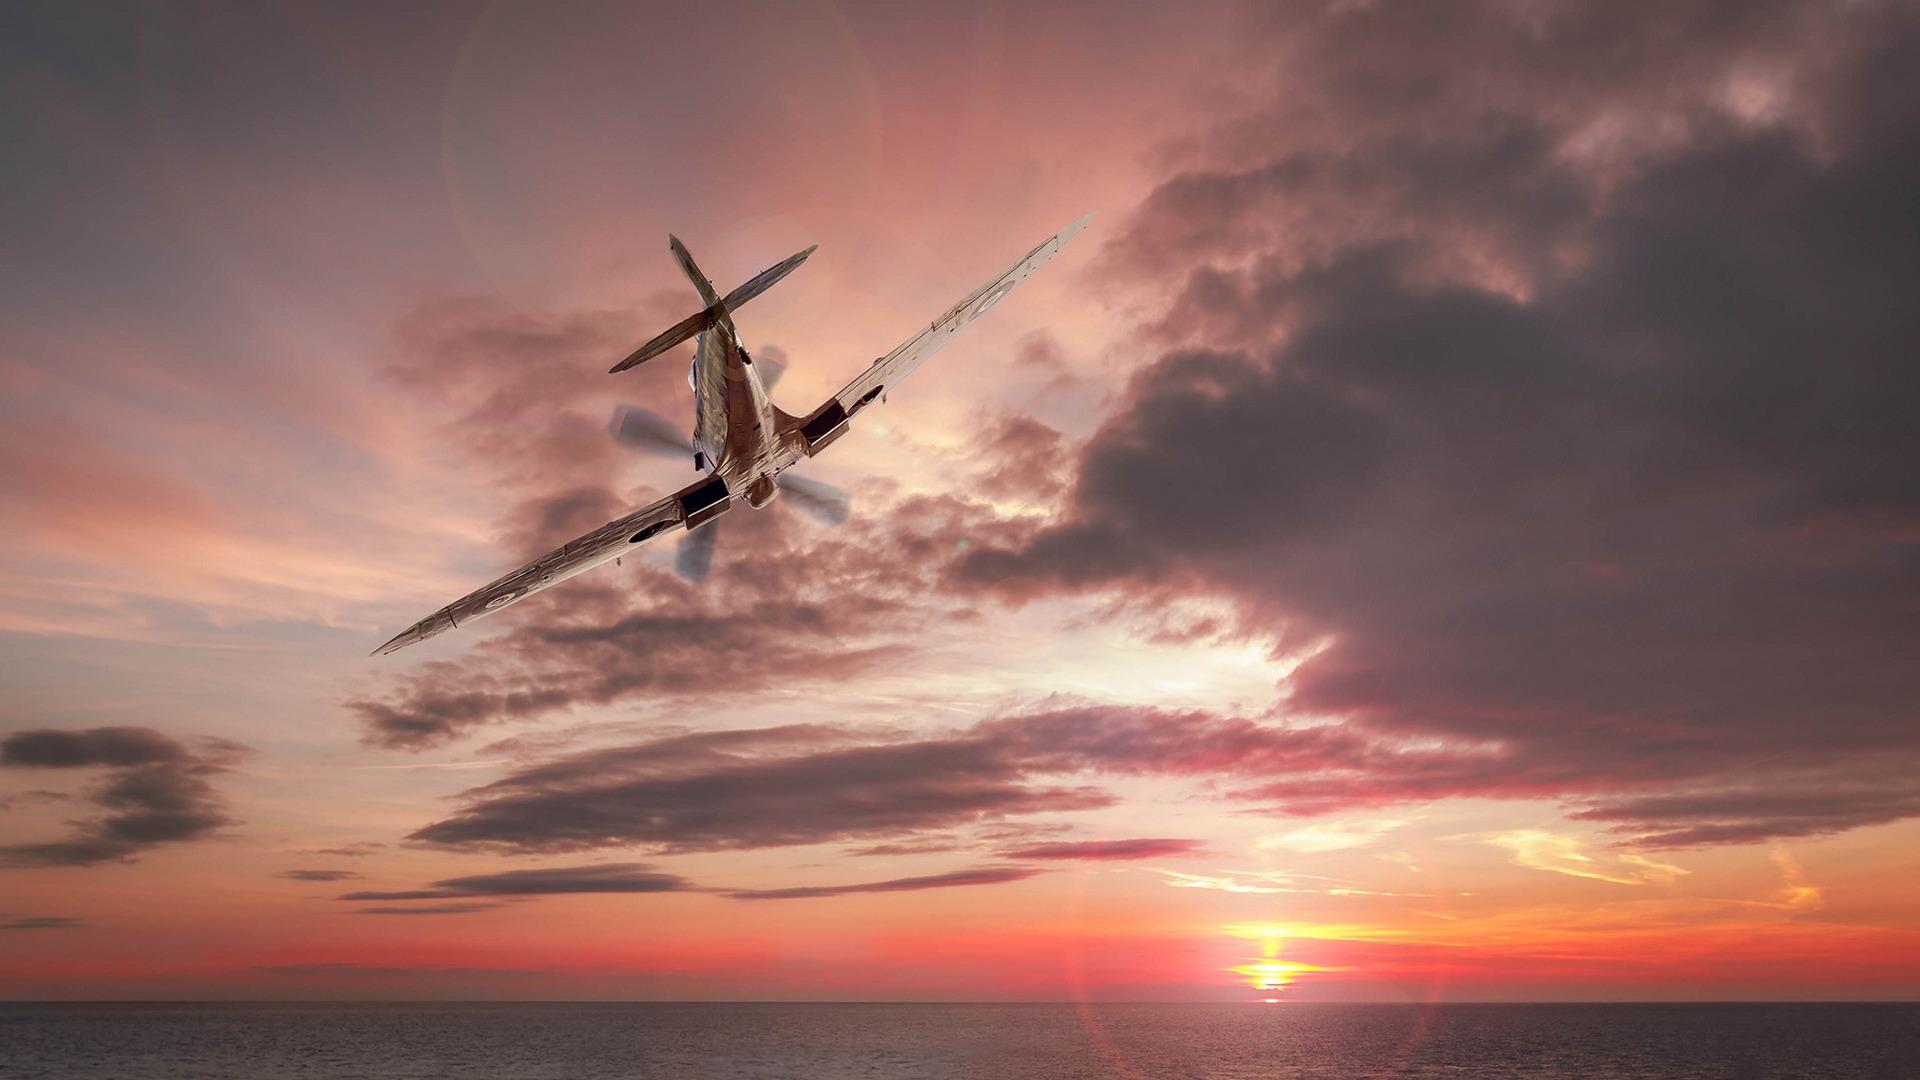 Картинки самолеты в небе над морем